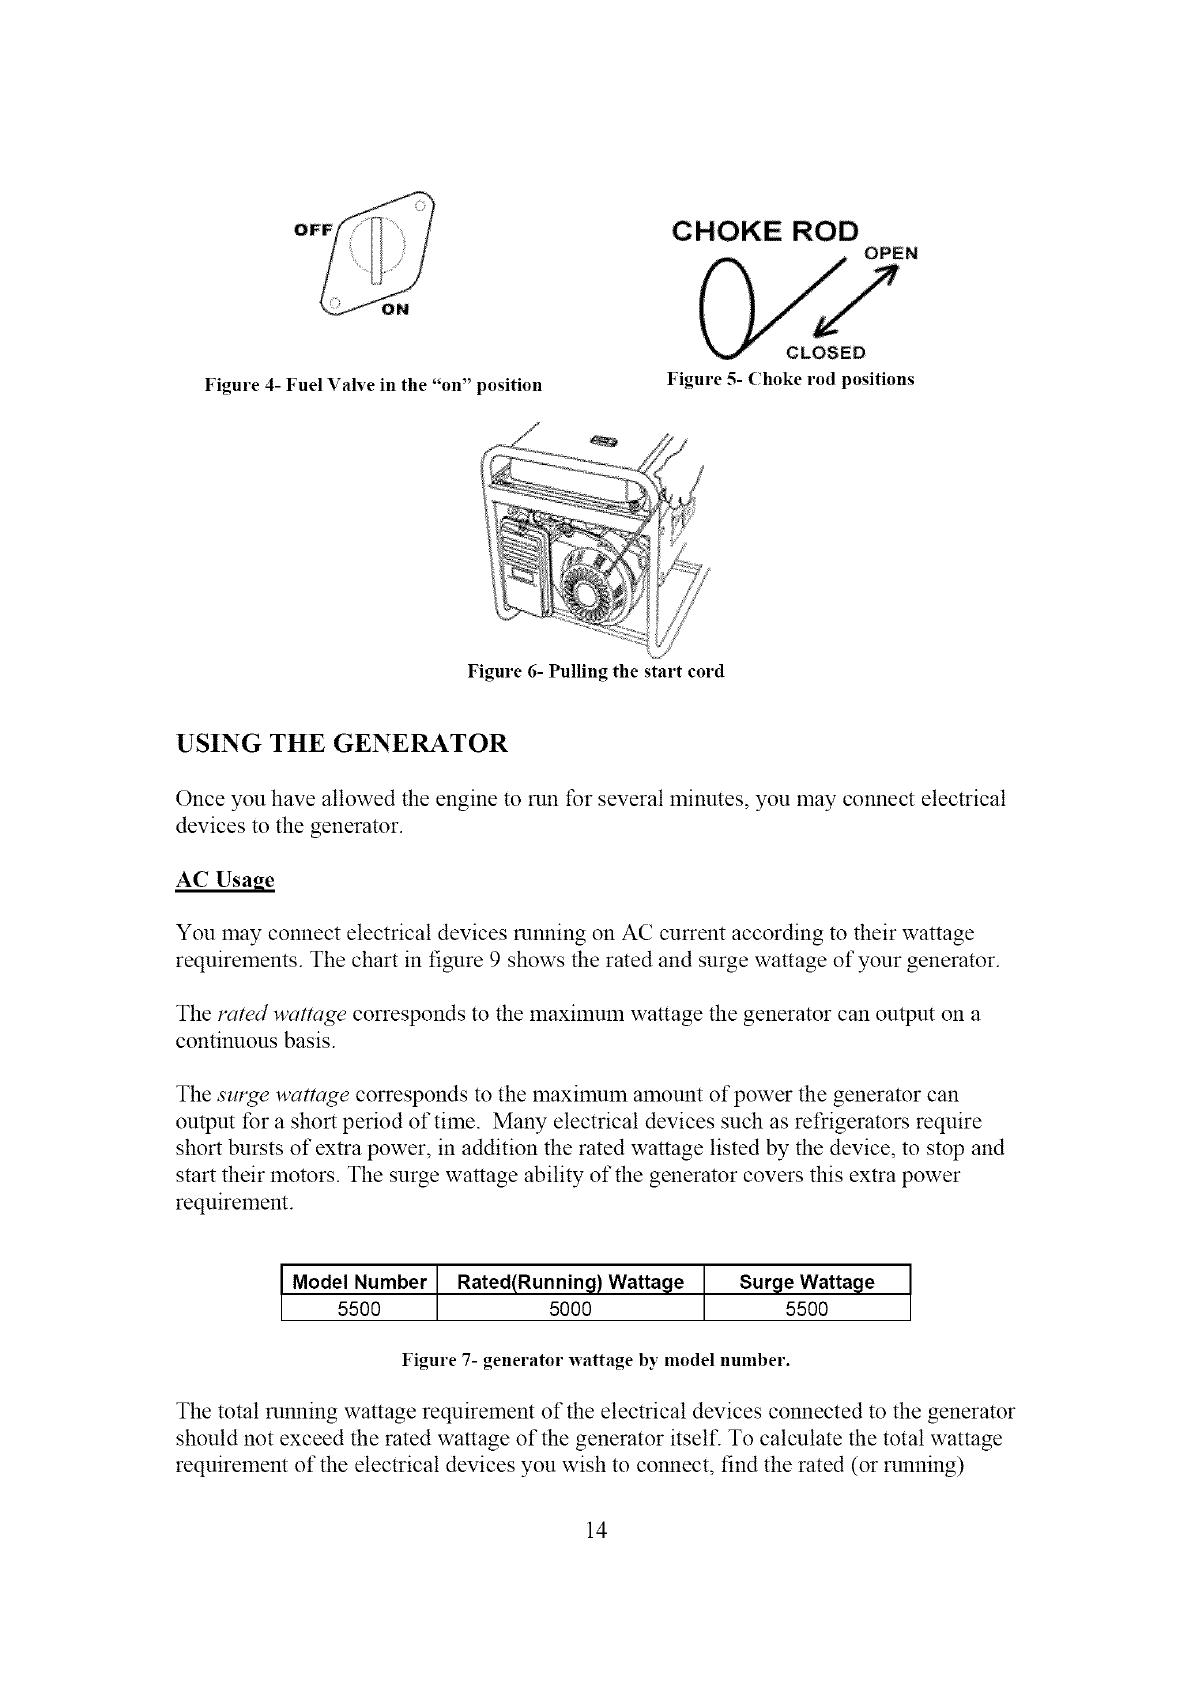 Power Pro Glt 5500 User Manual 13hp Generator Manuals And Guides Wen Wiring Diagram Off Choke Rod